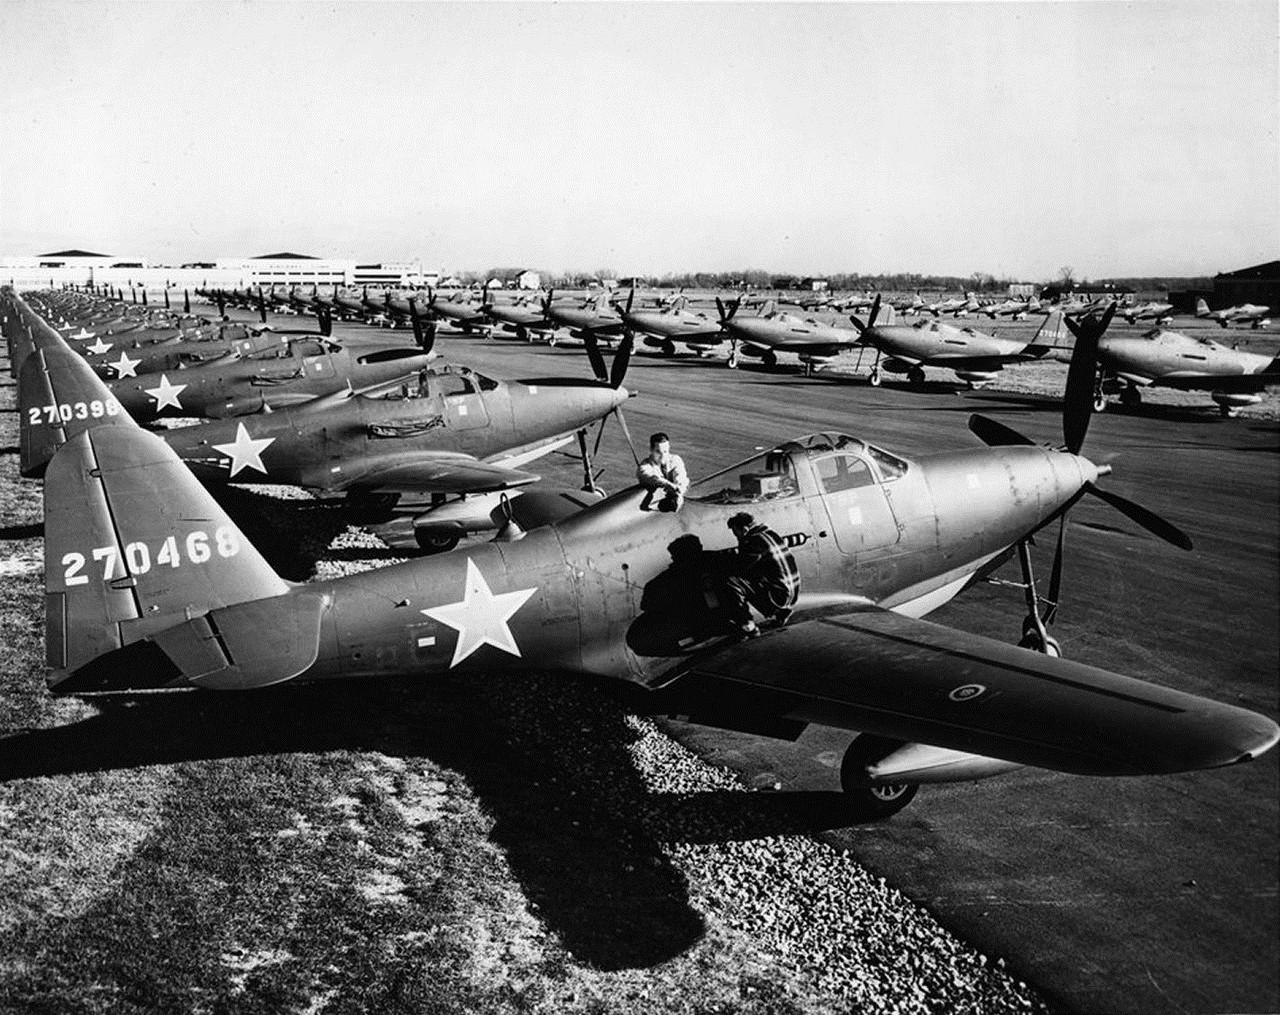 wgn_photos_warplanes_to_siberia_image_03_bell_p-63_kingcobra.jpg